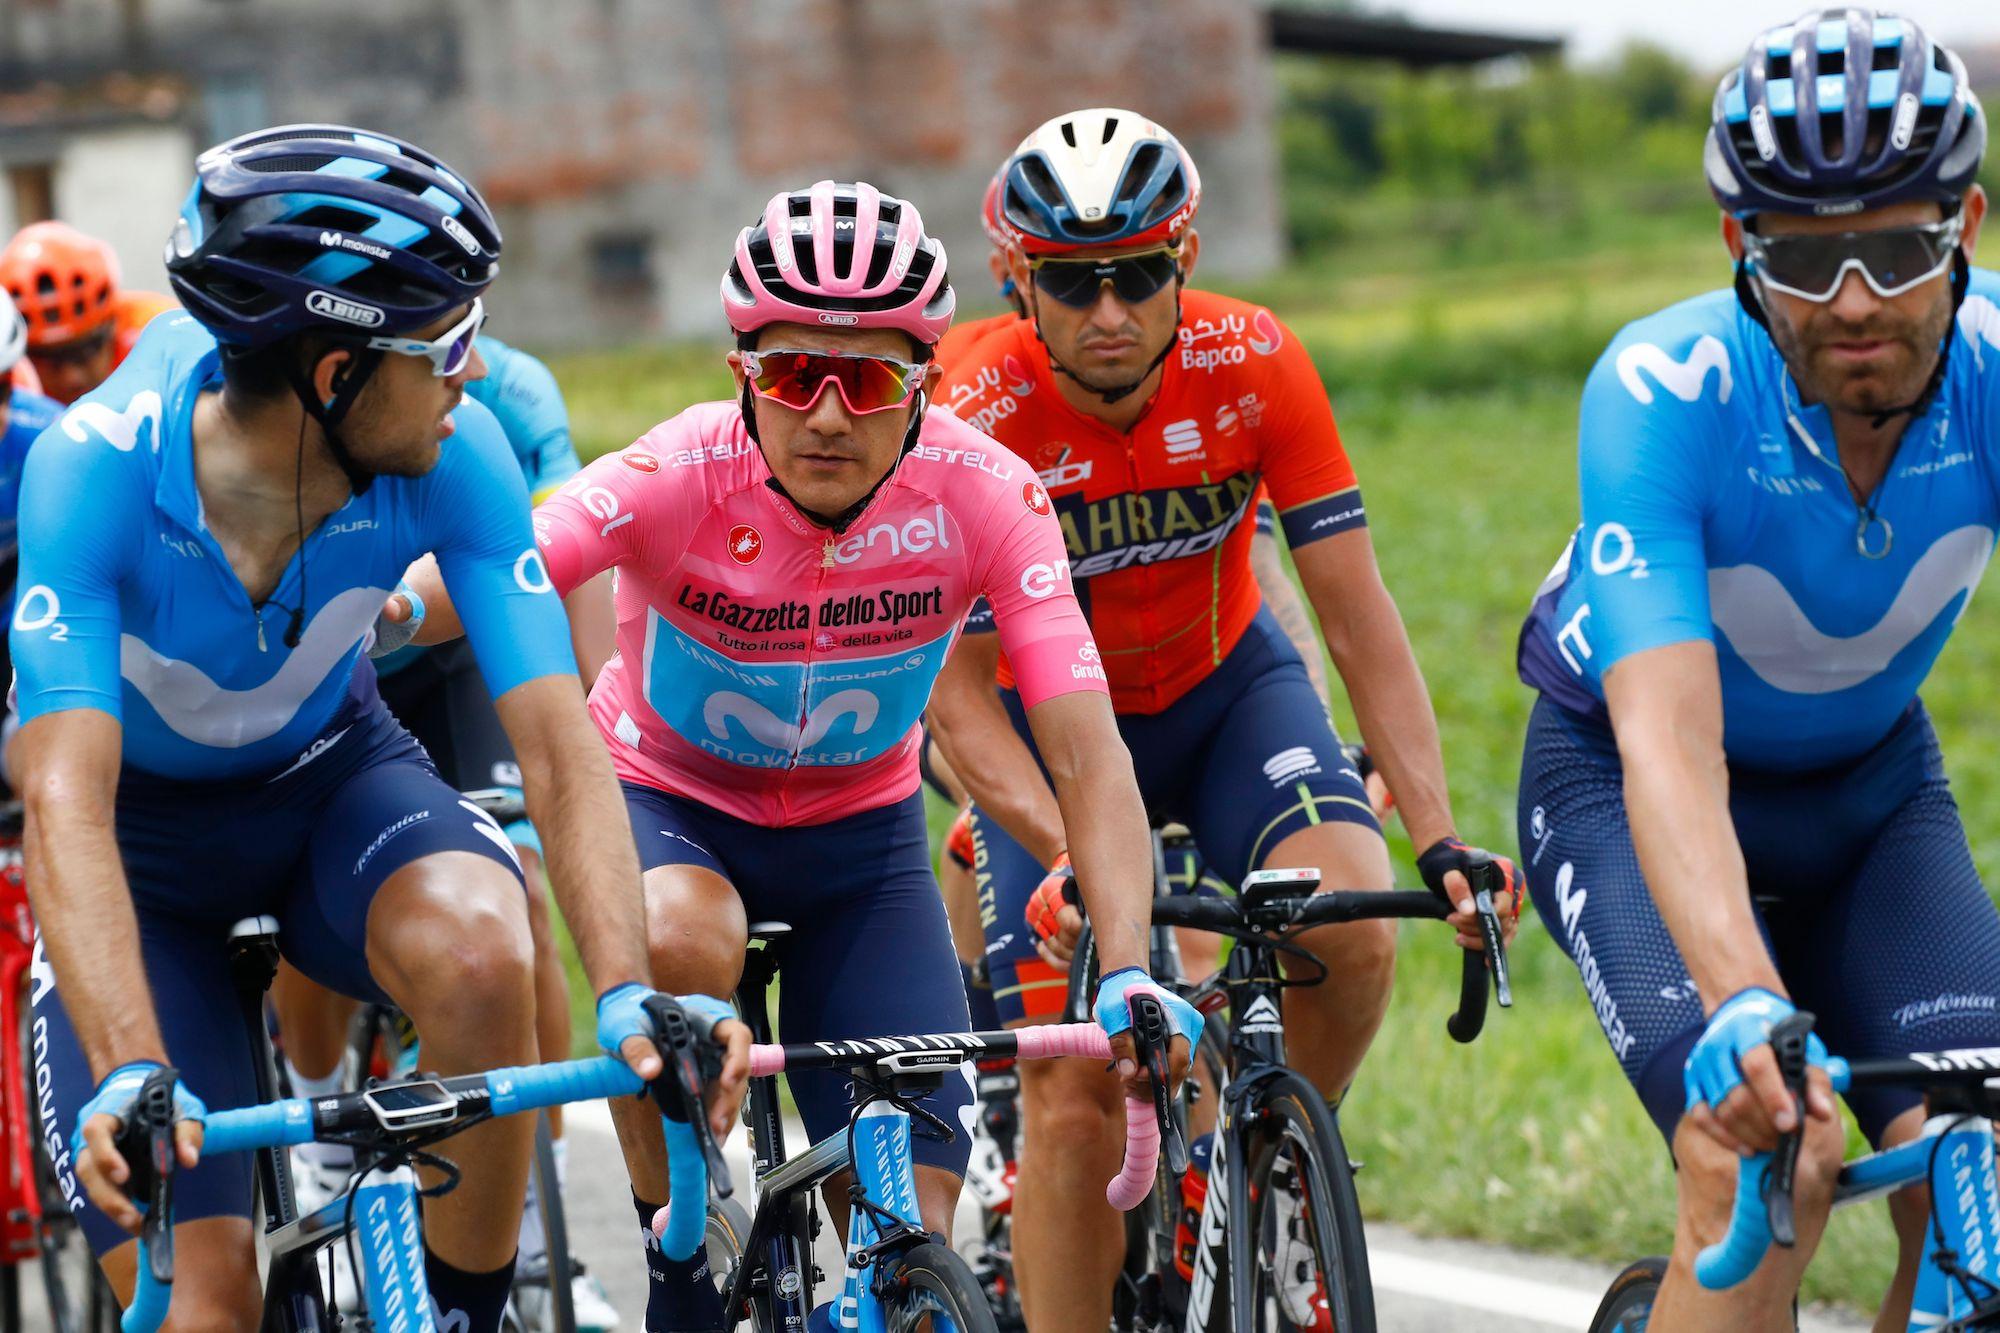 giro d italia stage 3 betting ak